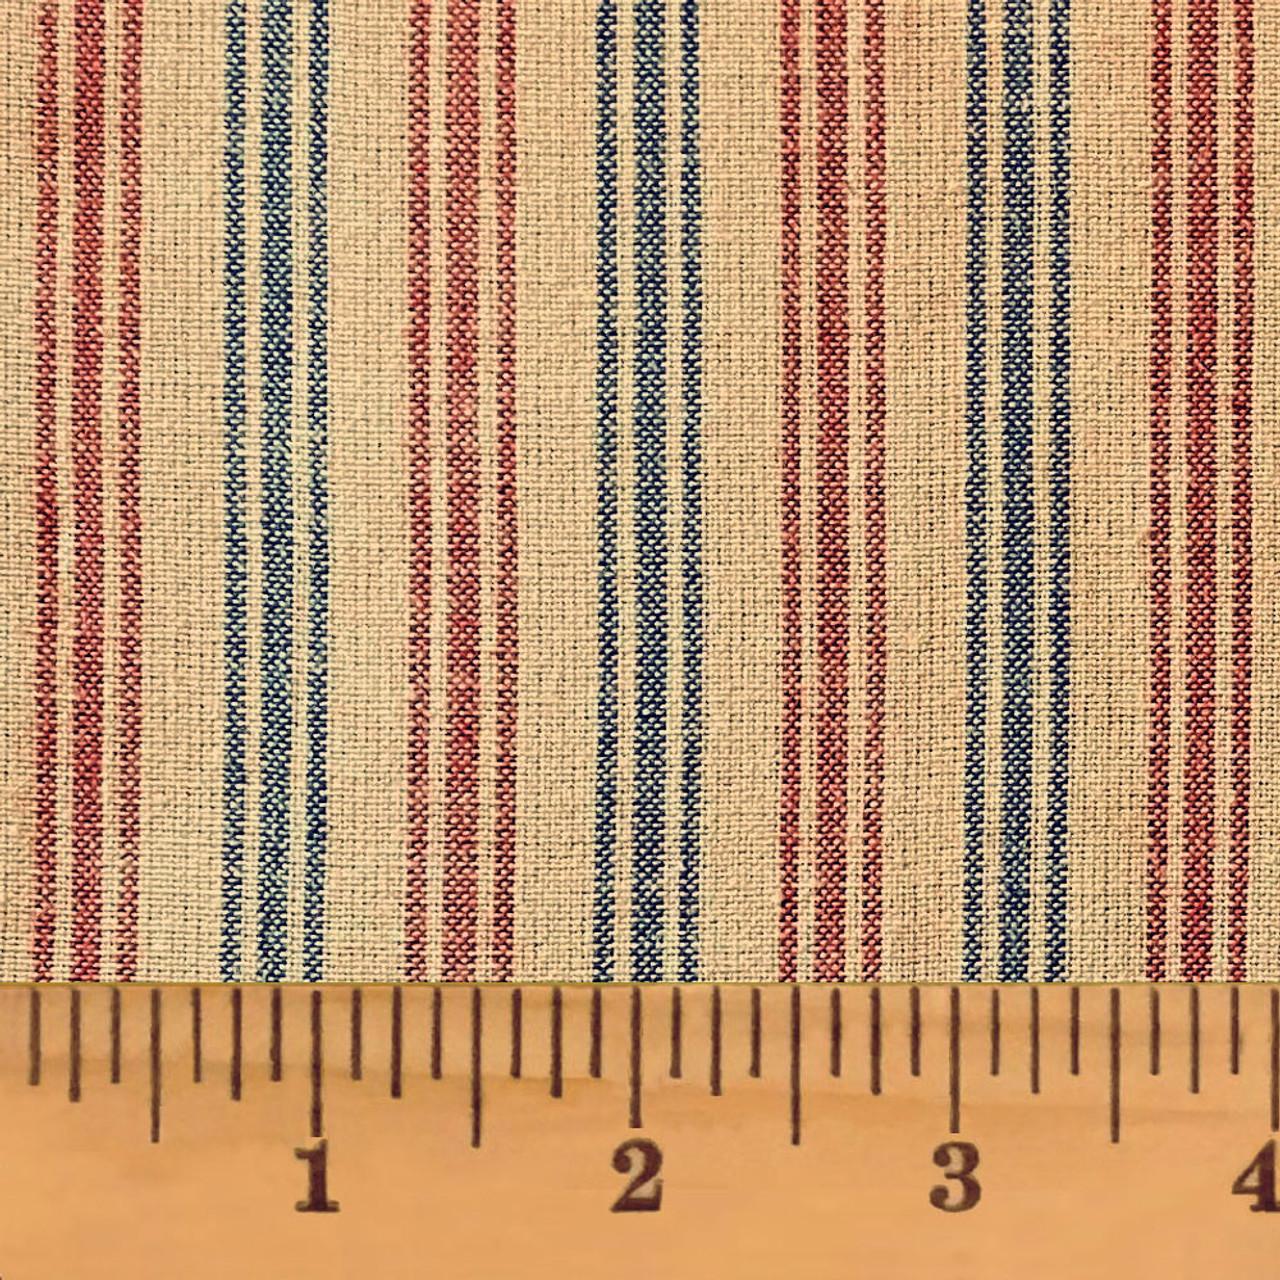 American Heritage Stripe Homespun Cotton Fabric